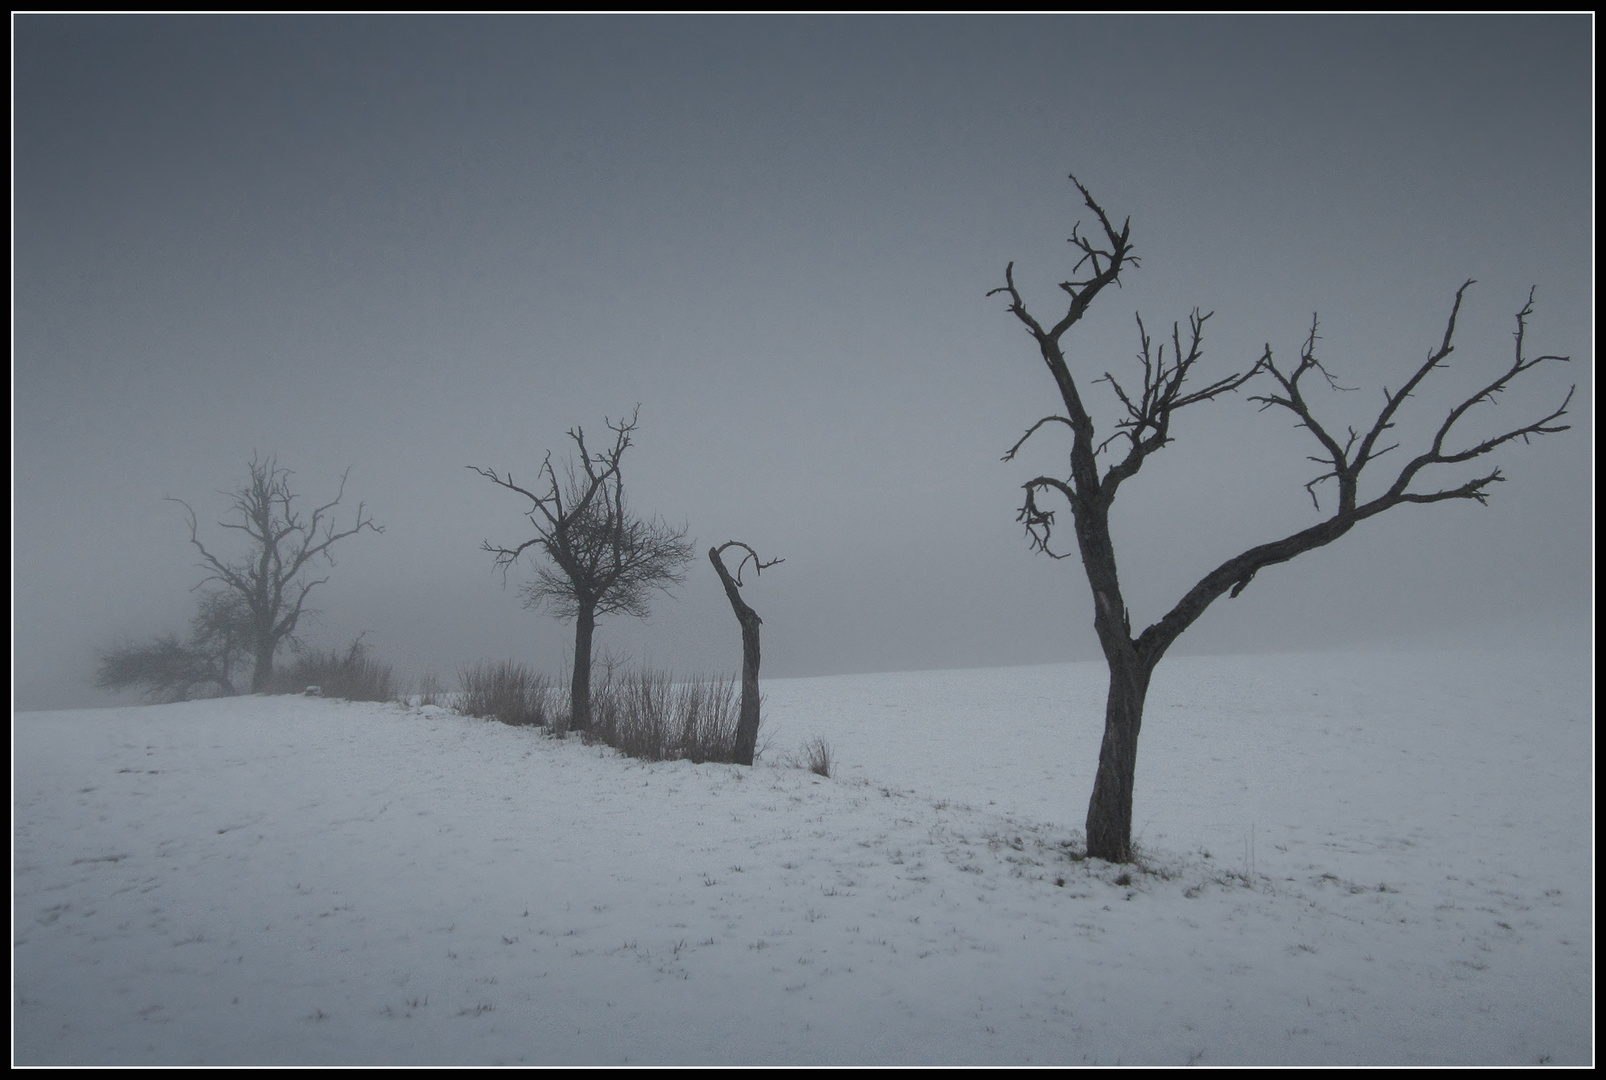 Winter - Impression 4